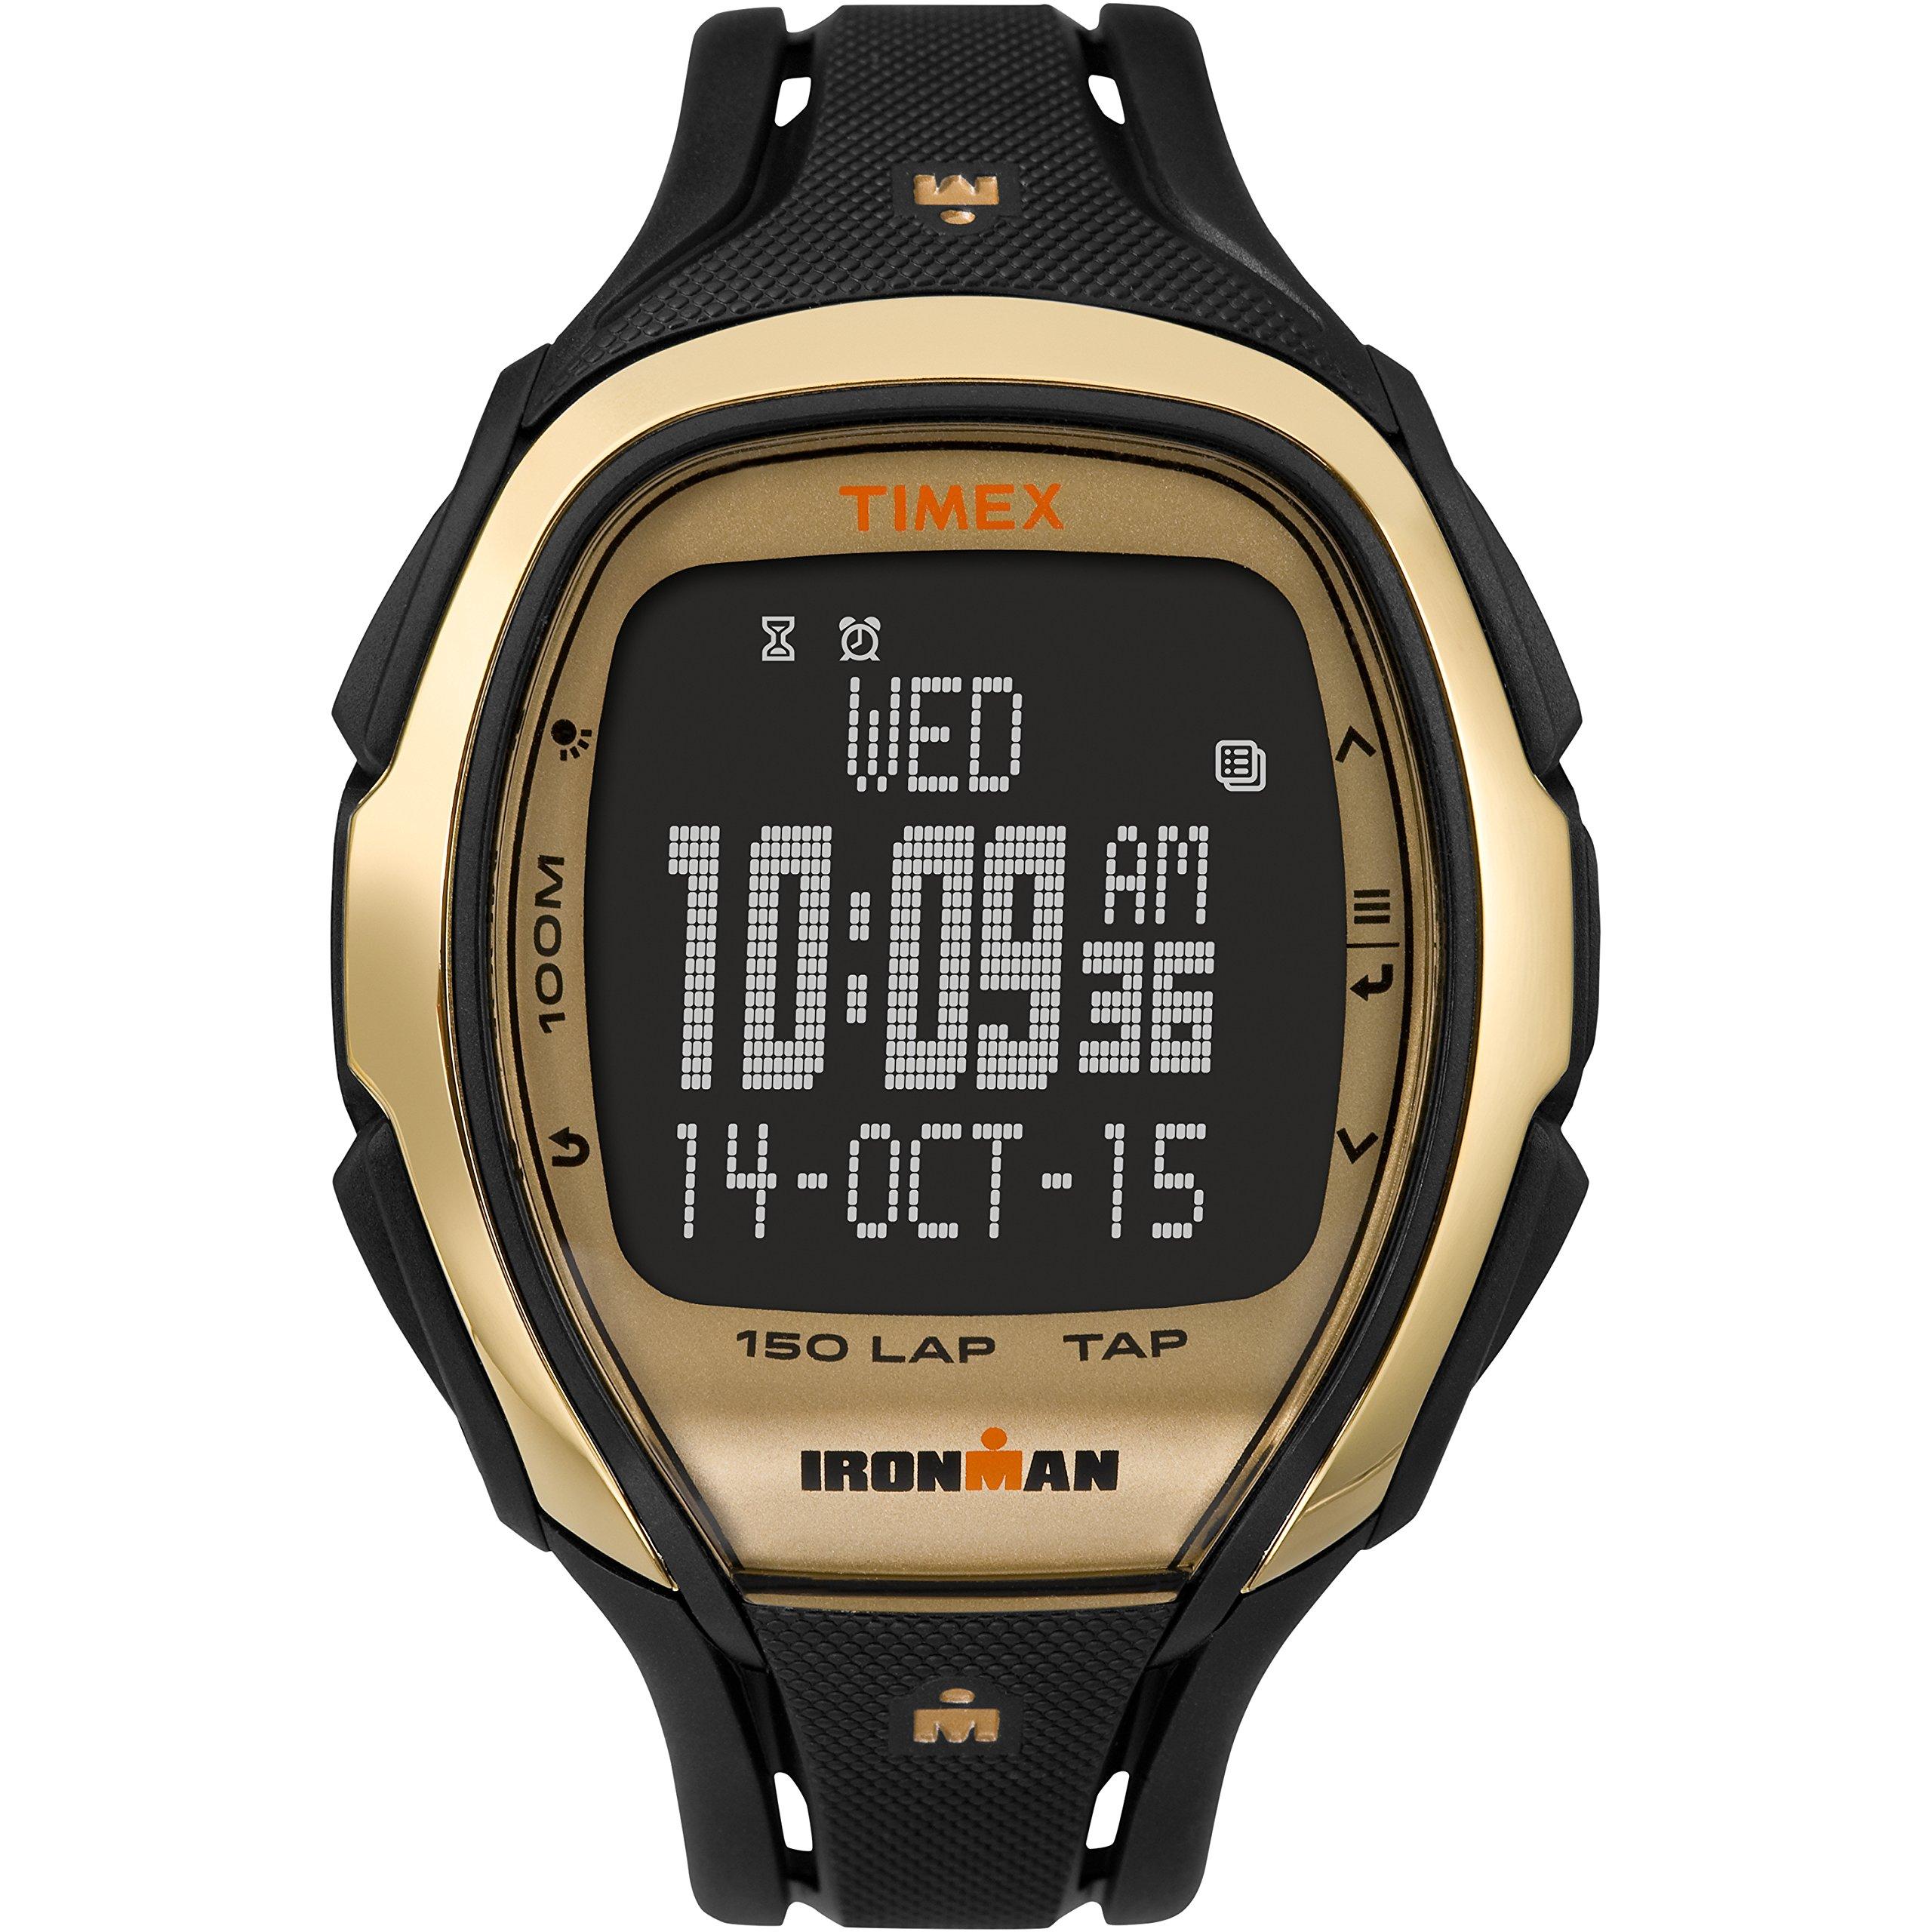 Timex Unisex TW5M05900 Ironman Sleek 150 Tapscreen Full-Size Black/Gold-Tone Resin Strap Watch by Timex